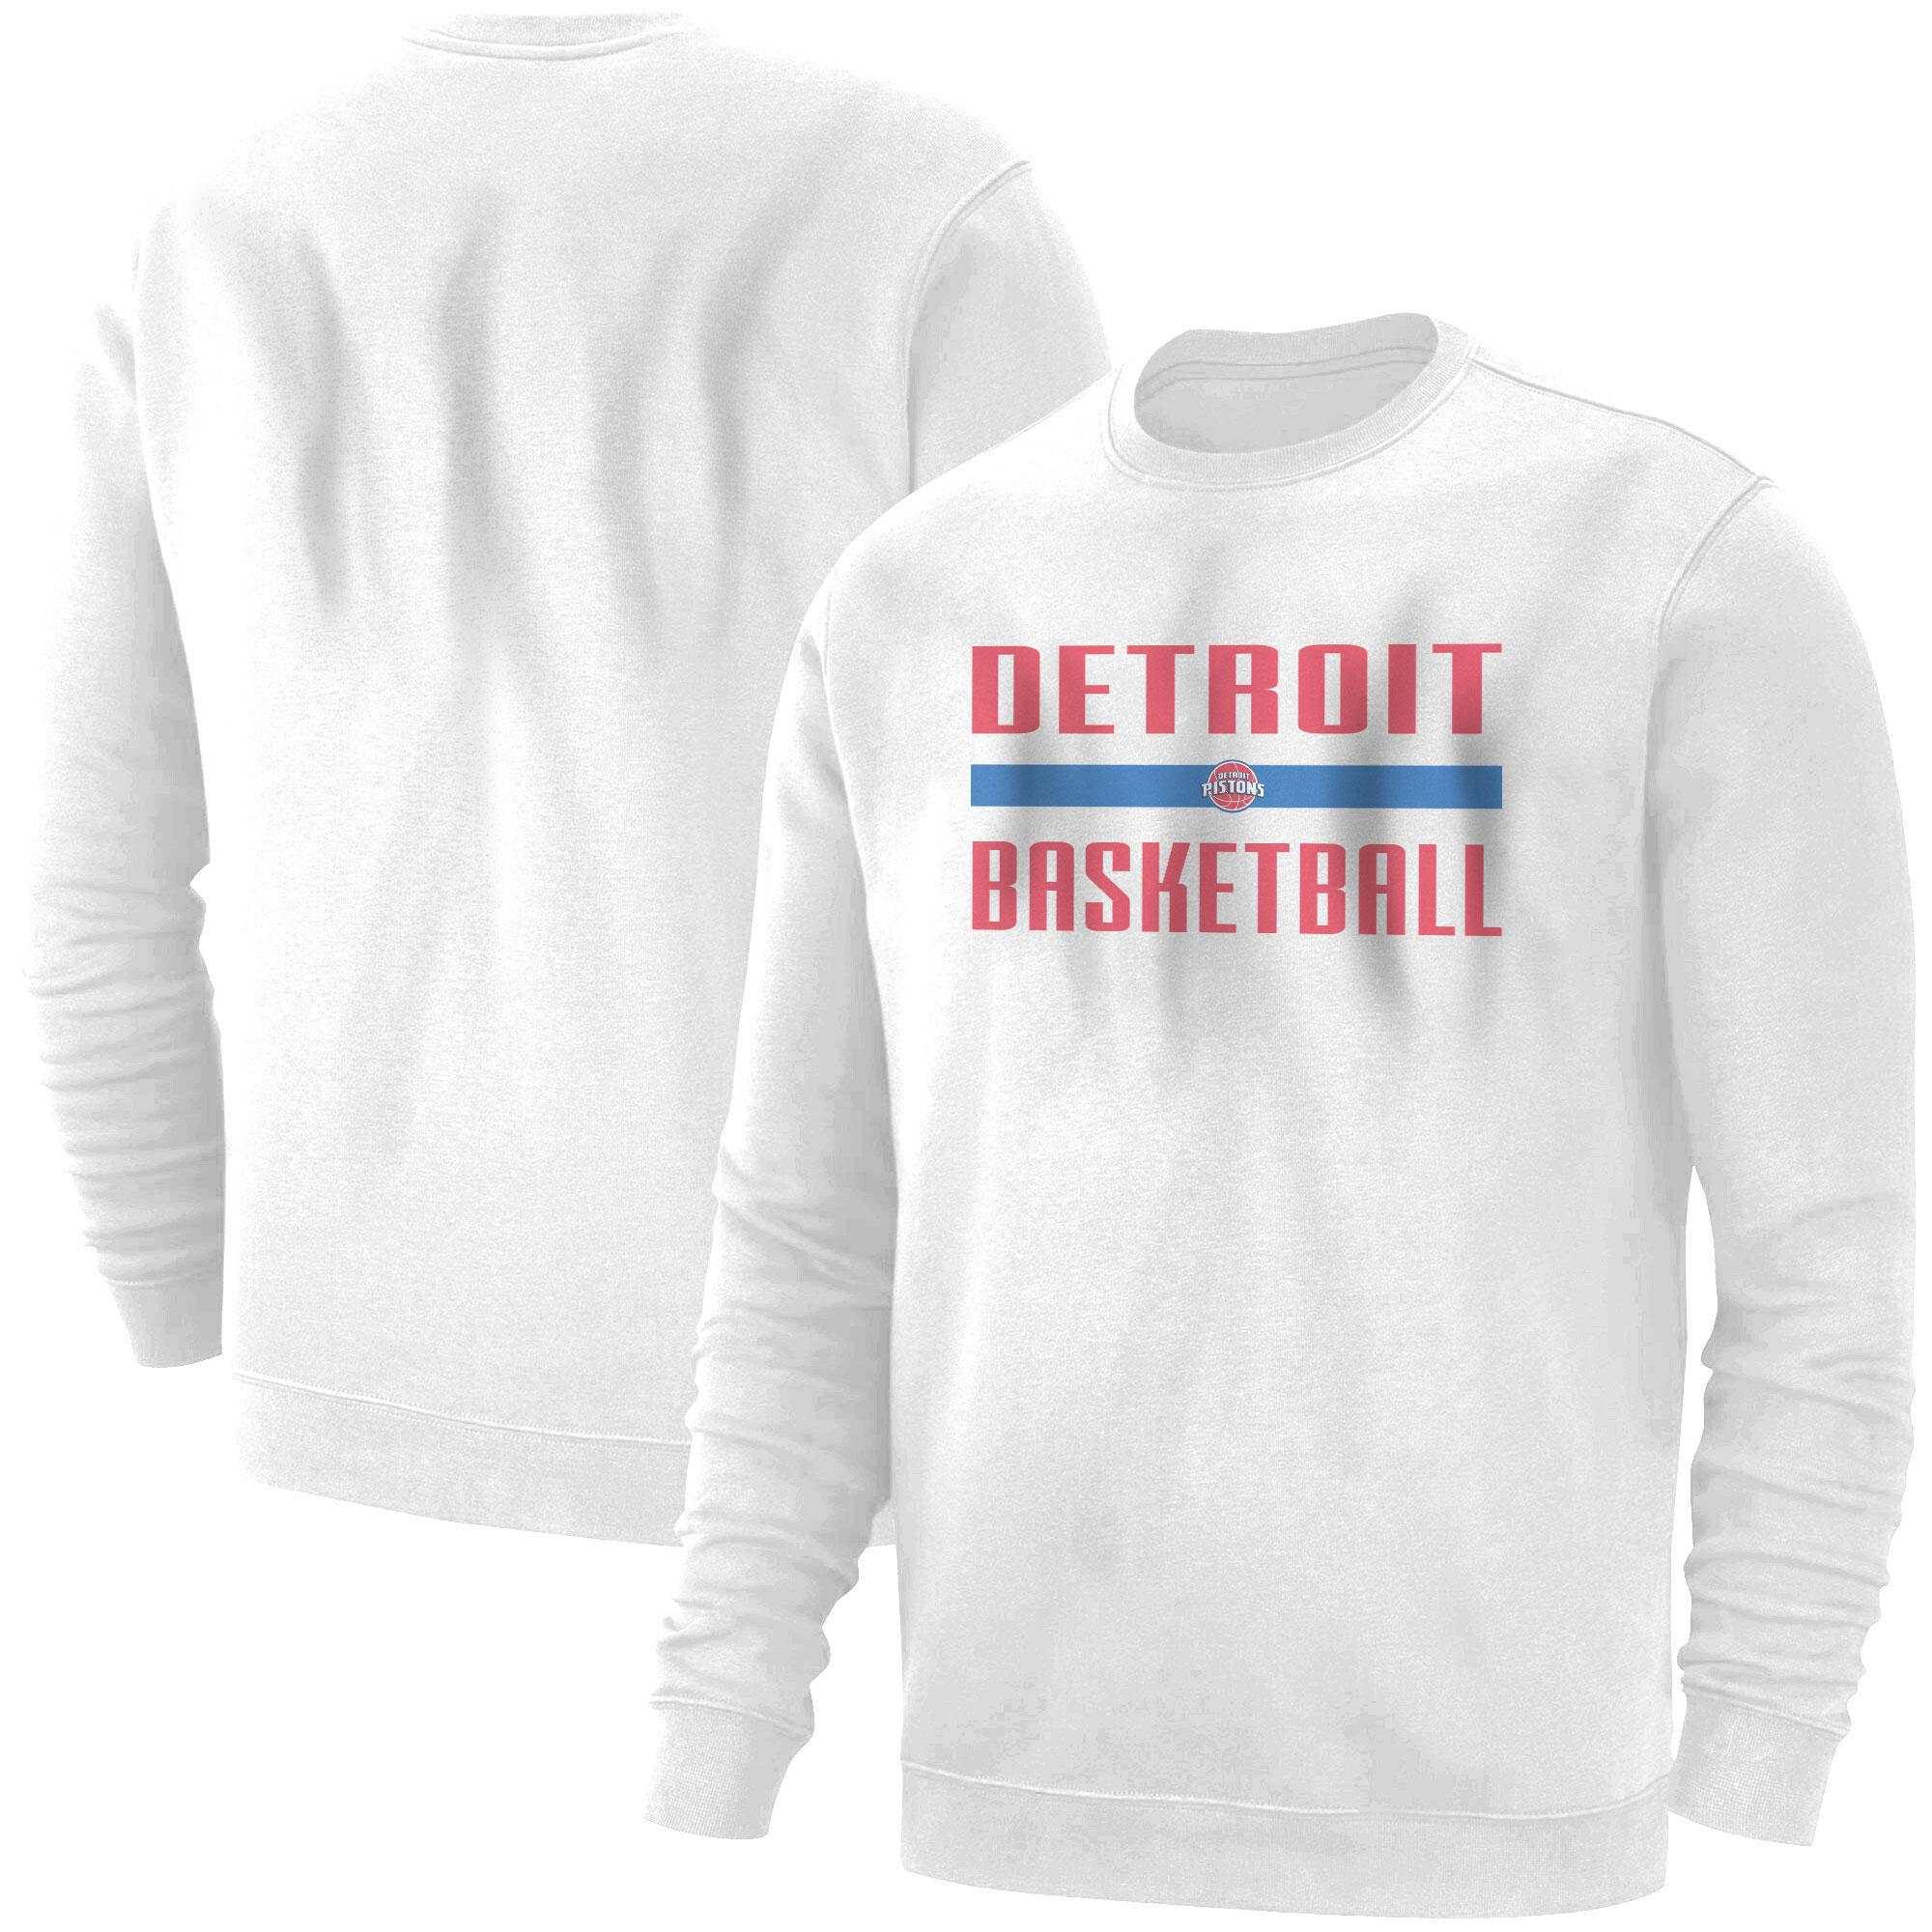 Detroit Basketball Basic (BSC-WHT-NP-detroit-bsktbll-510)